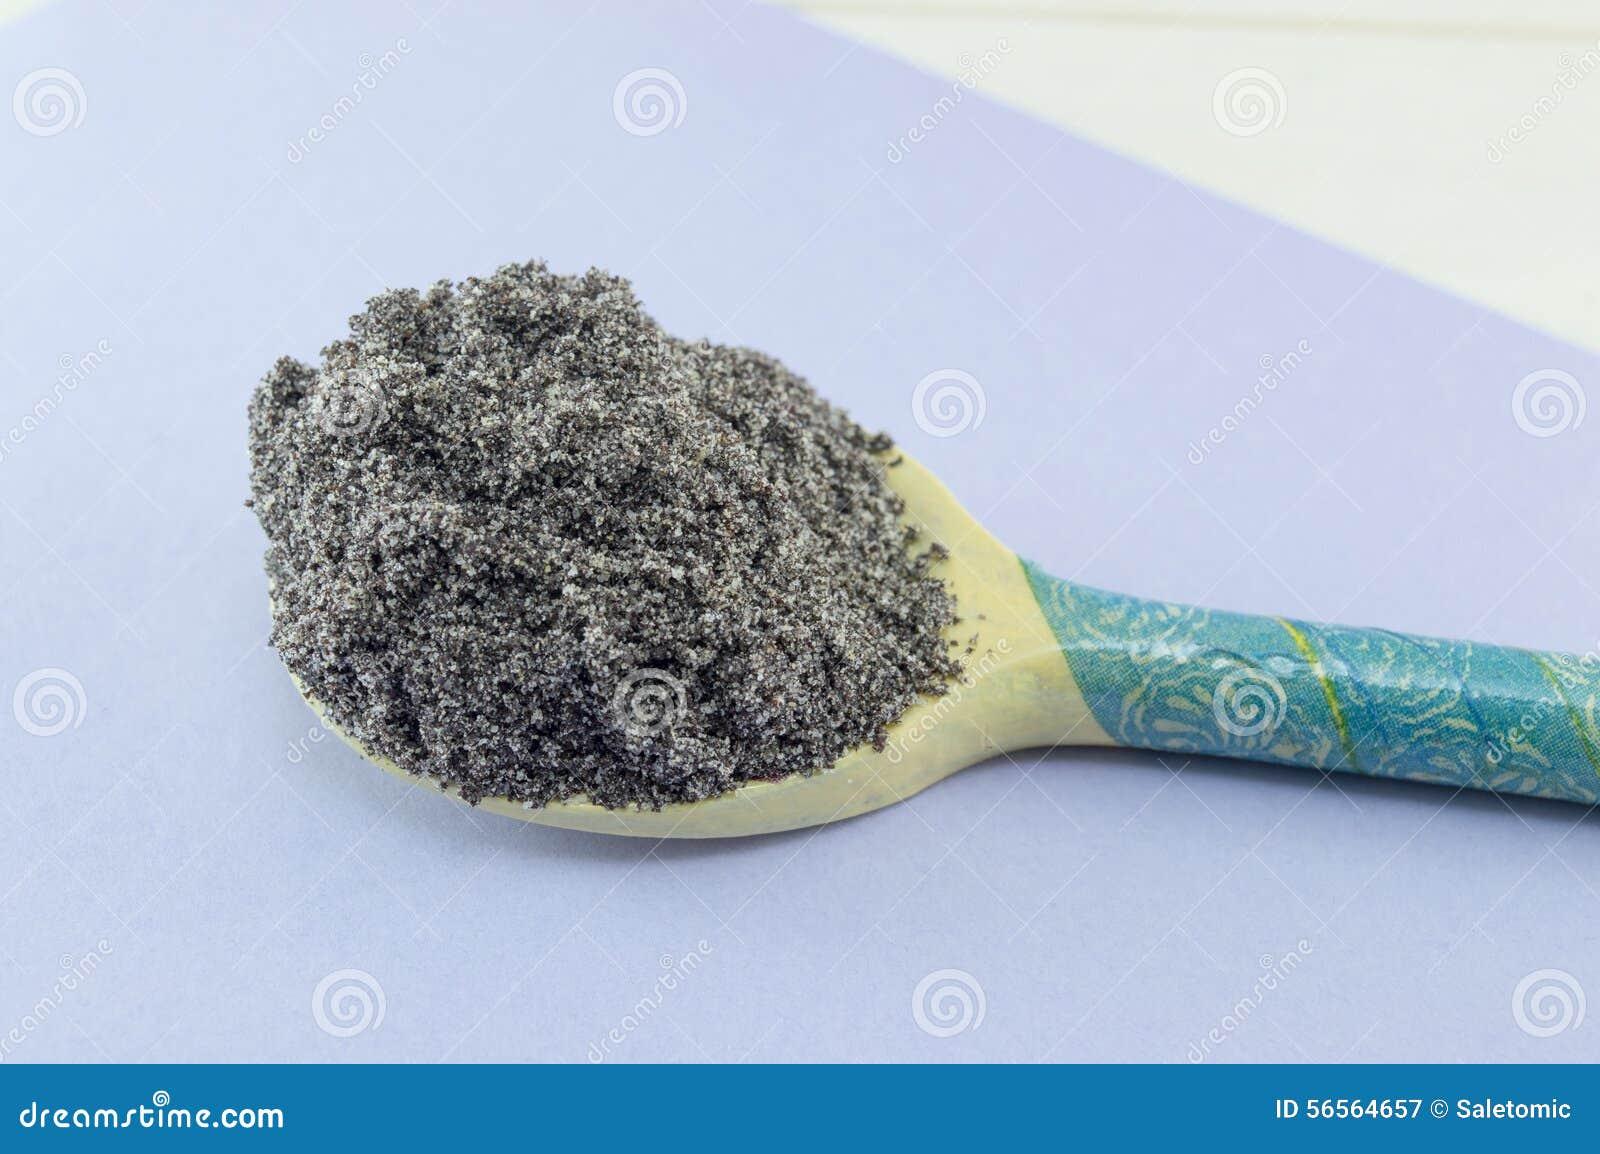 Download Σπόροι παπαρουνών σε ένα διακοσμημένο Decoupage κουτάλι Στοκ Εικόνα - εικόνα από καρύκευμα, συστατικό: 56564657